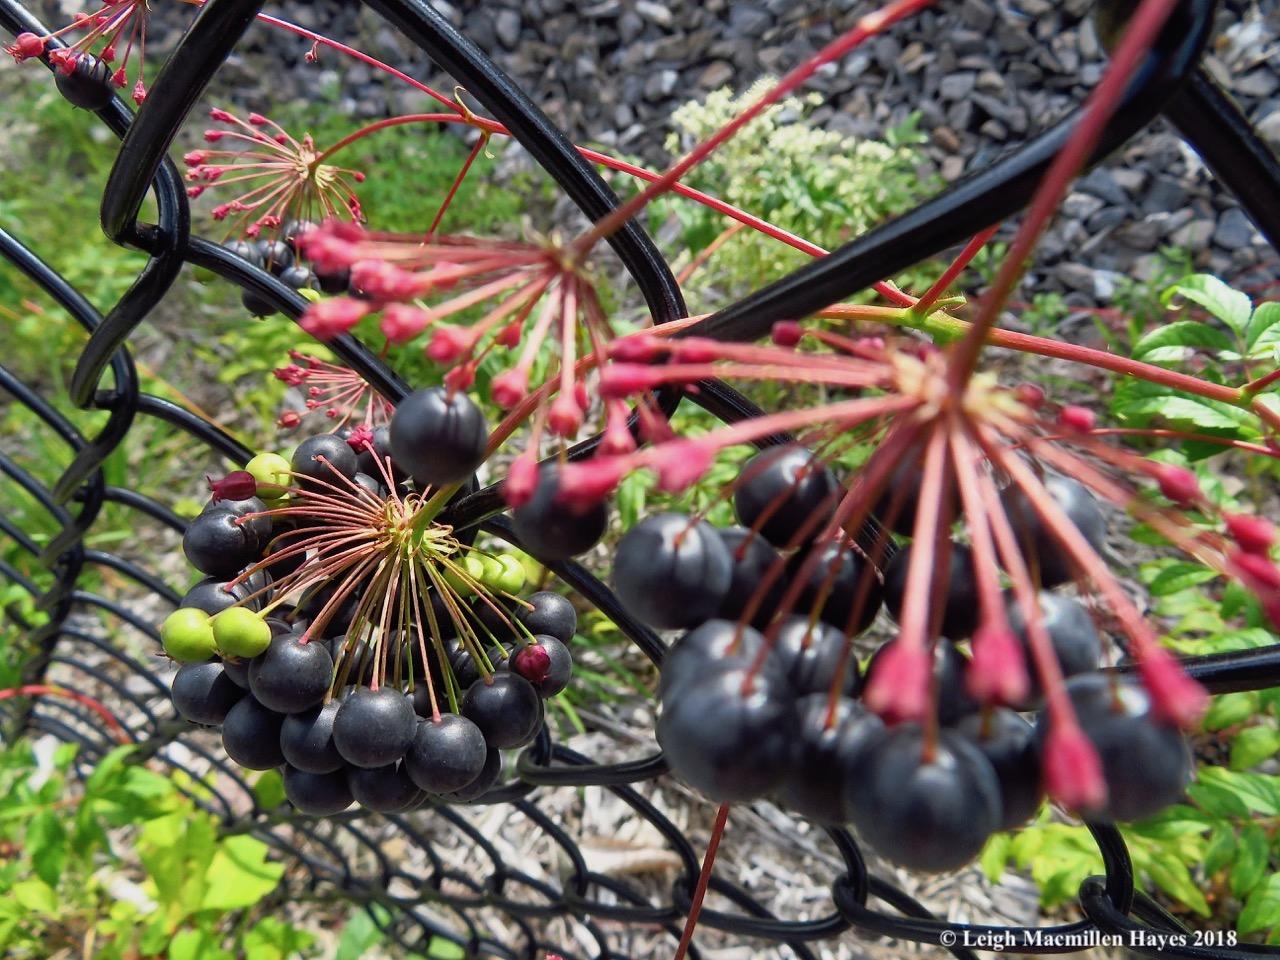 17-Bristly sarsaparilla fruits